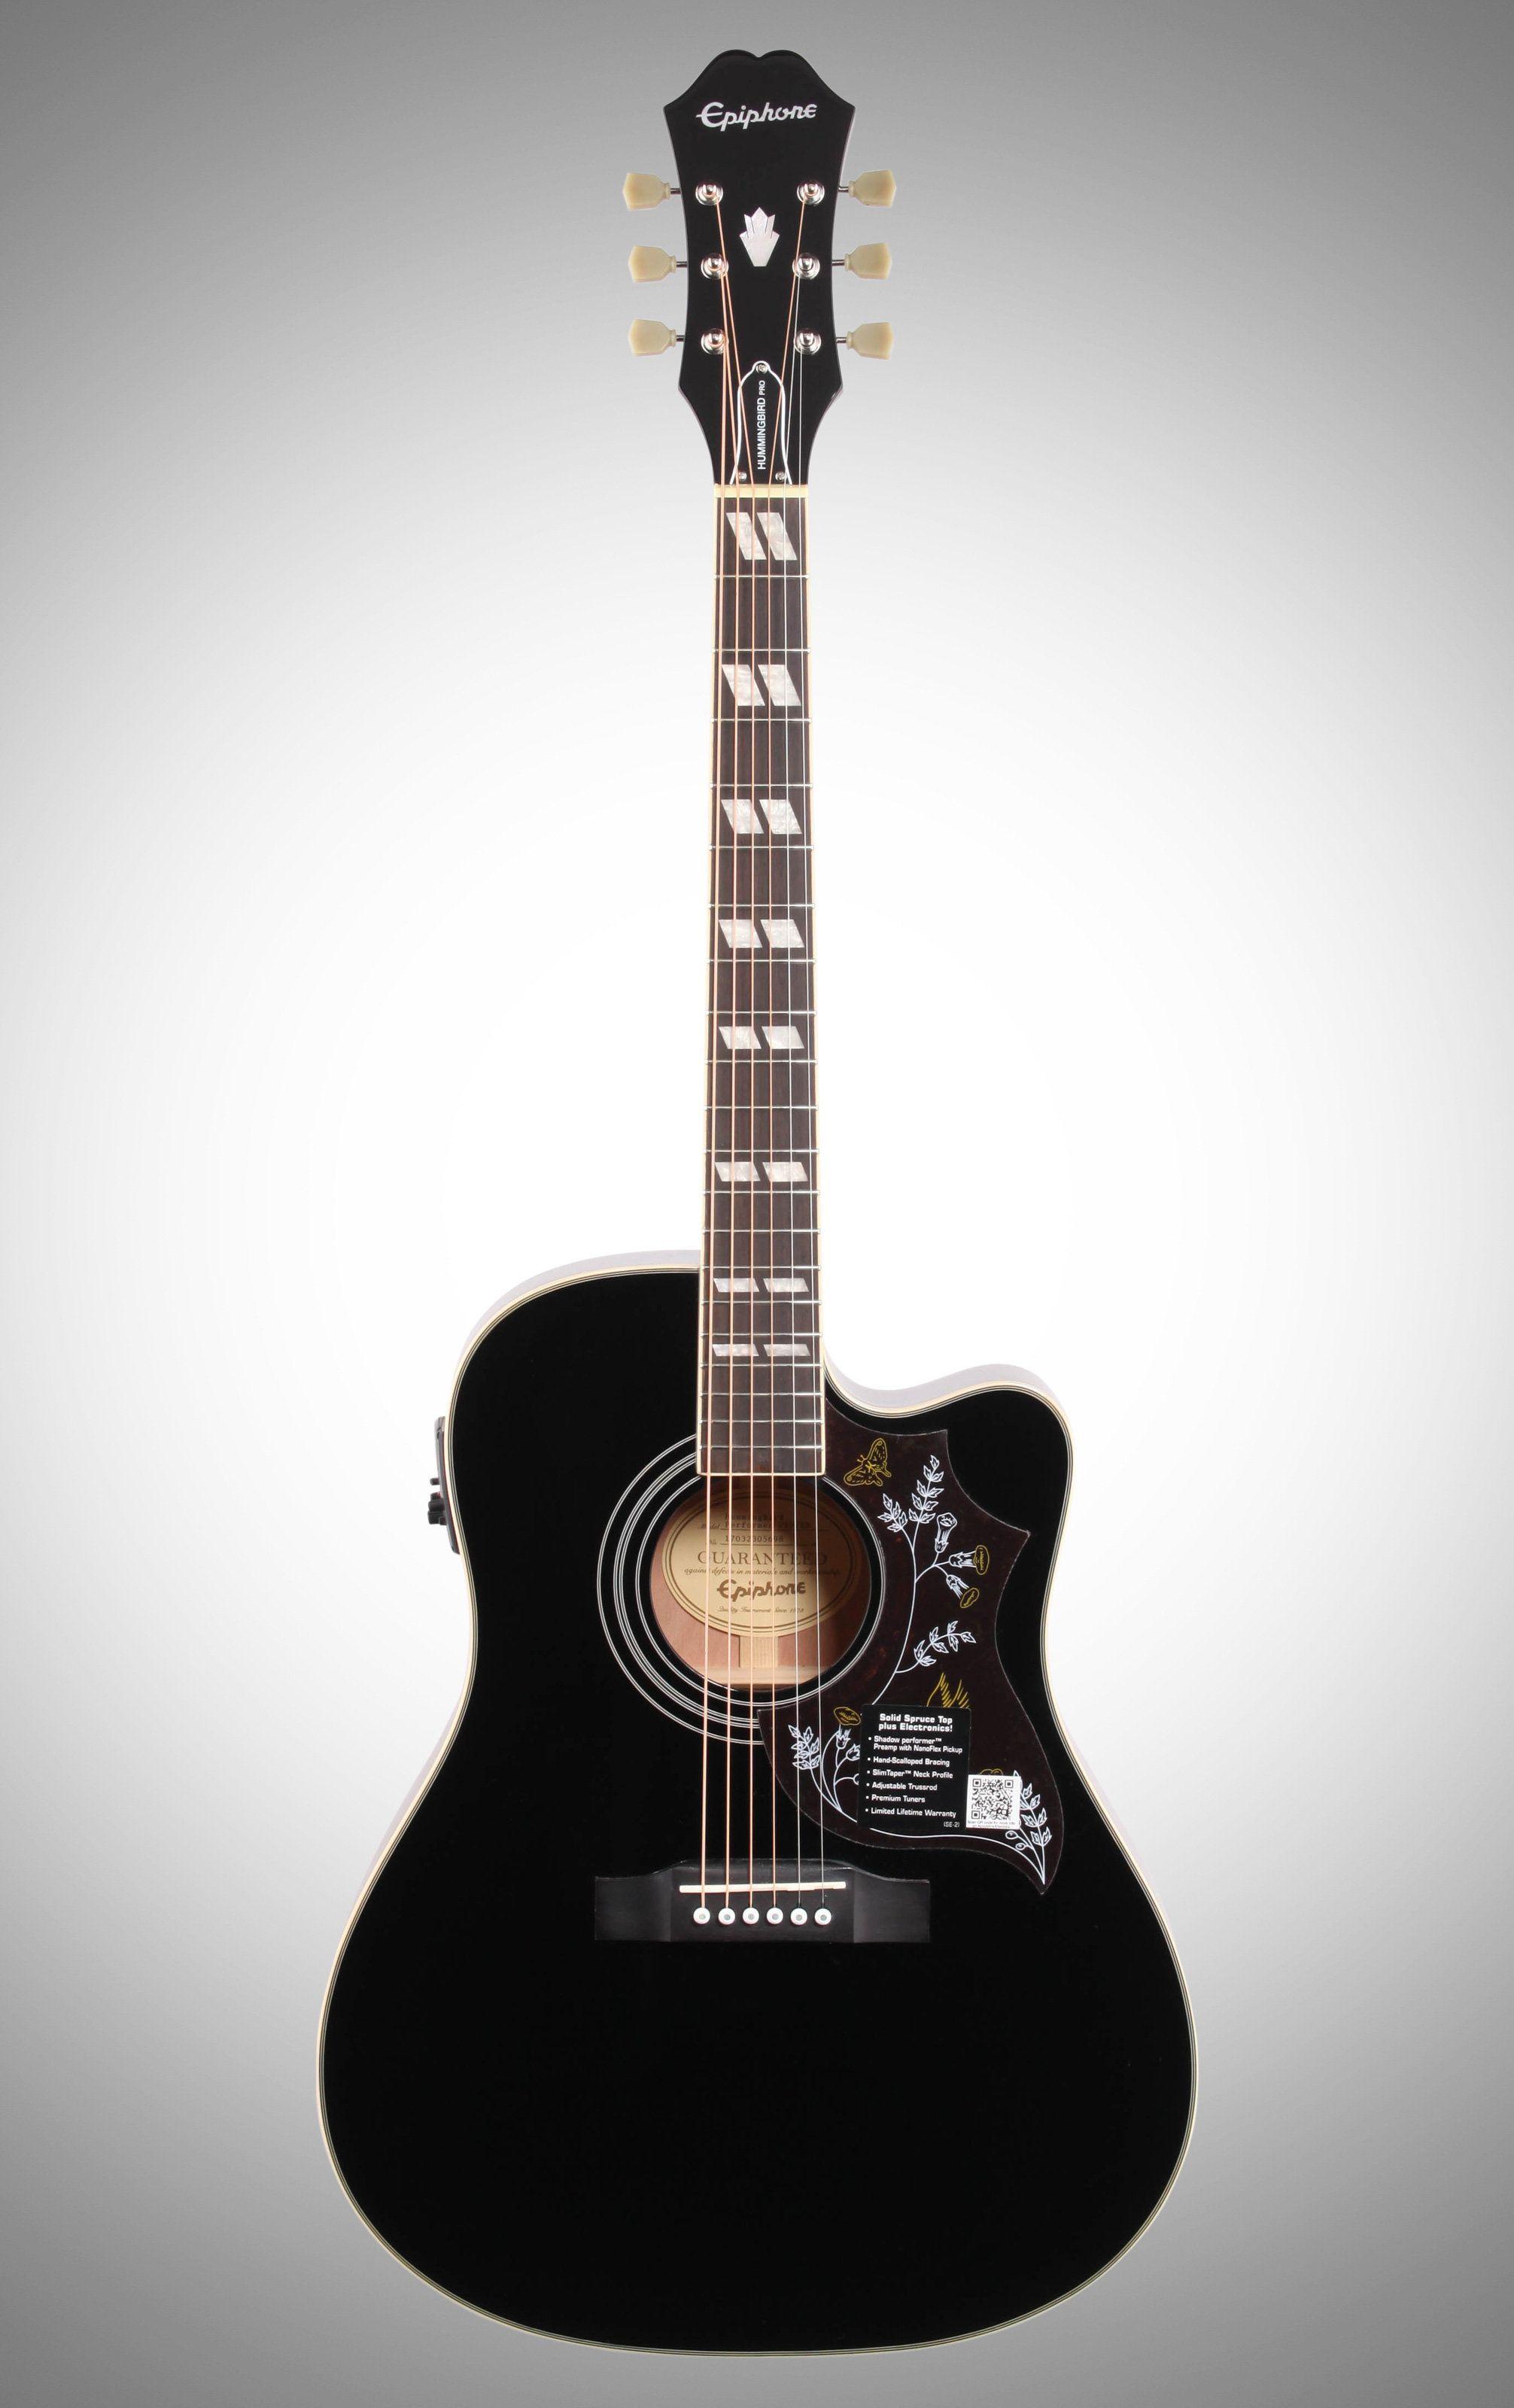 Epiphone Exclusive Hummingbird Pro Cutaway Acoustic Electric Epiphone Hummingbird Guitar